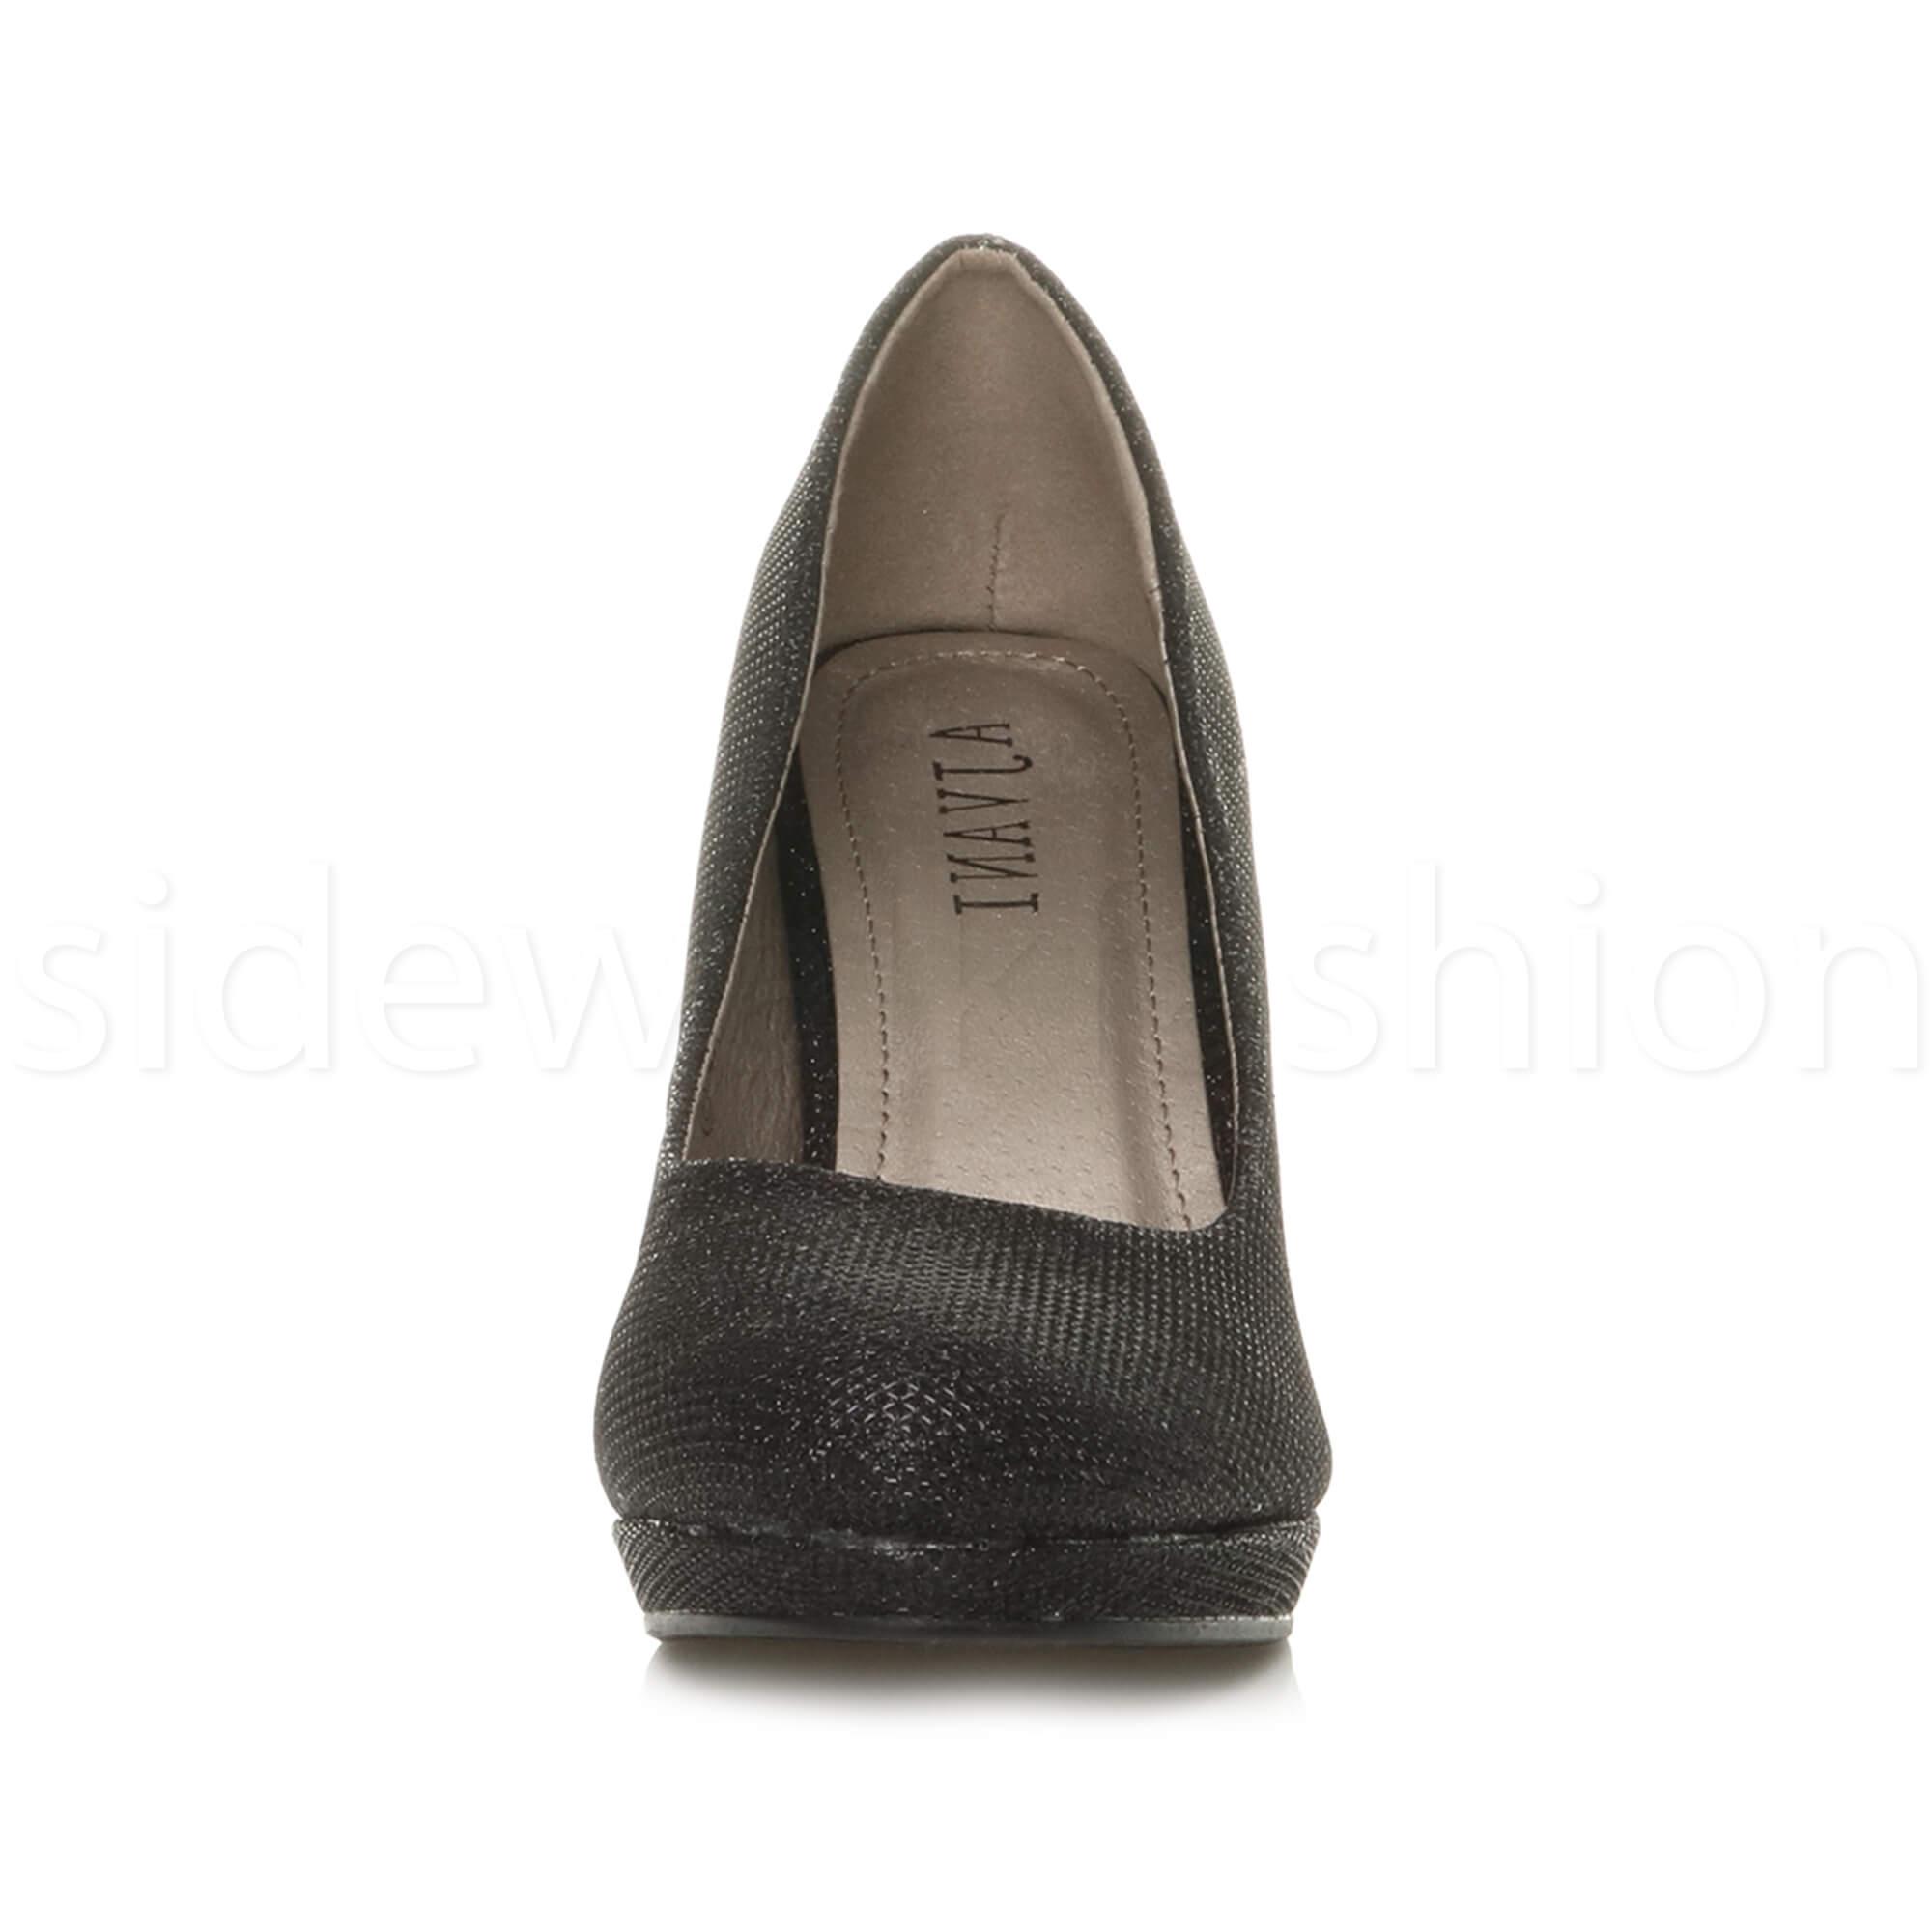 Womens-ladies-high-mid-heel-platform-wedding-evening-bridesmaid-court-shoes-size thumbnail 13